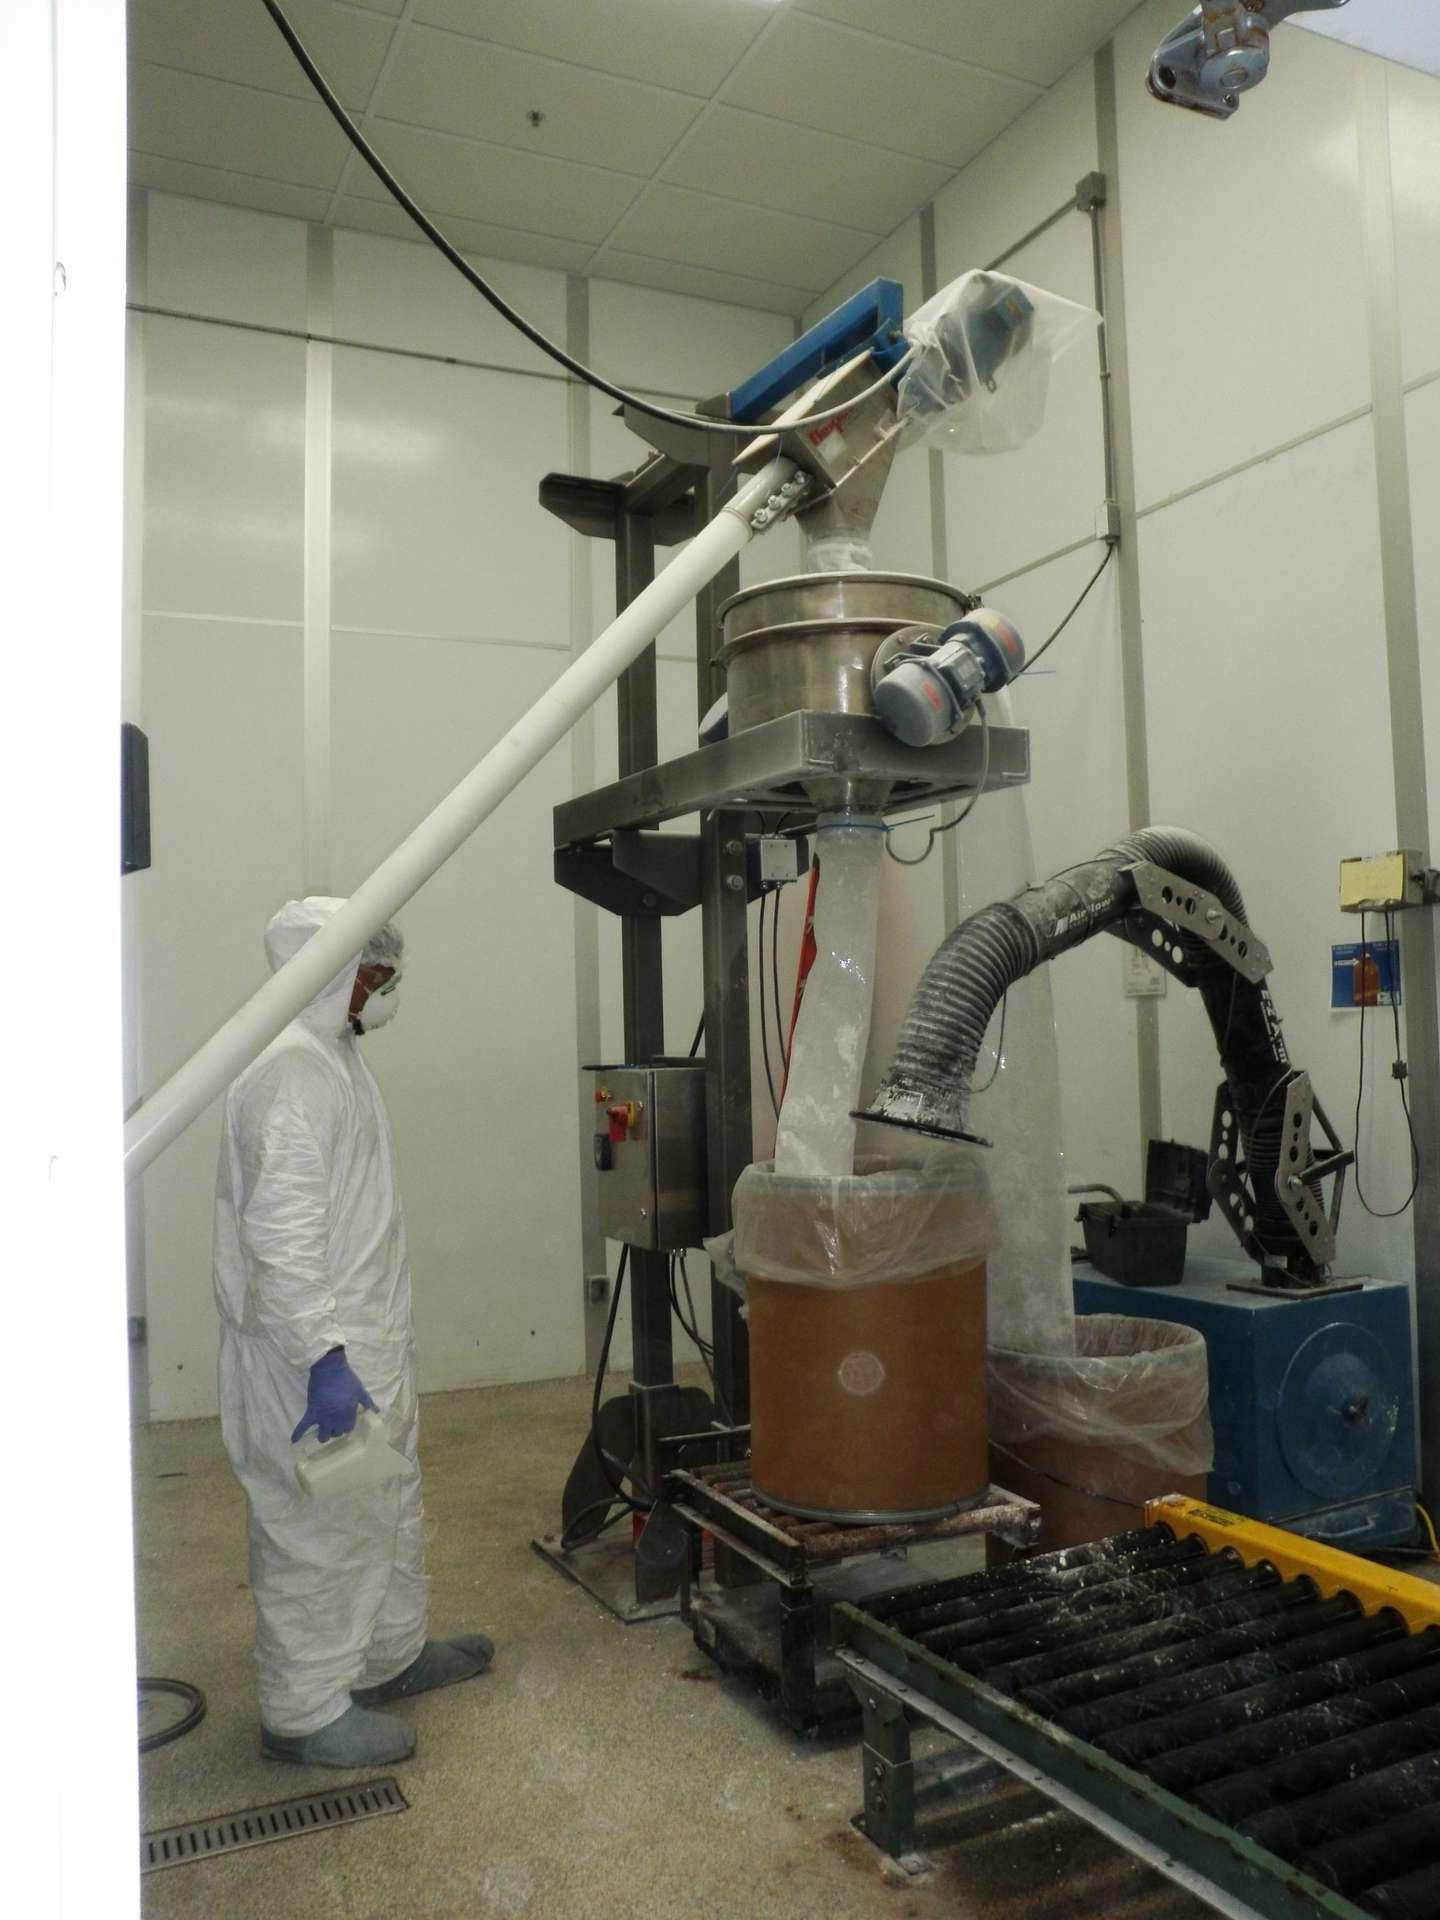 vibratory sieve processing ceramic powder